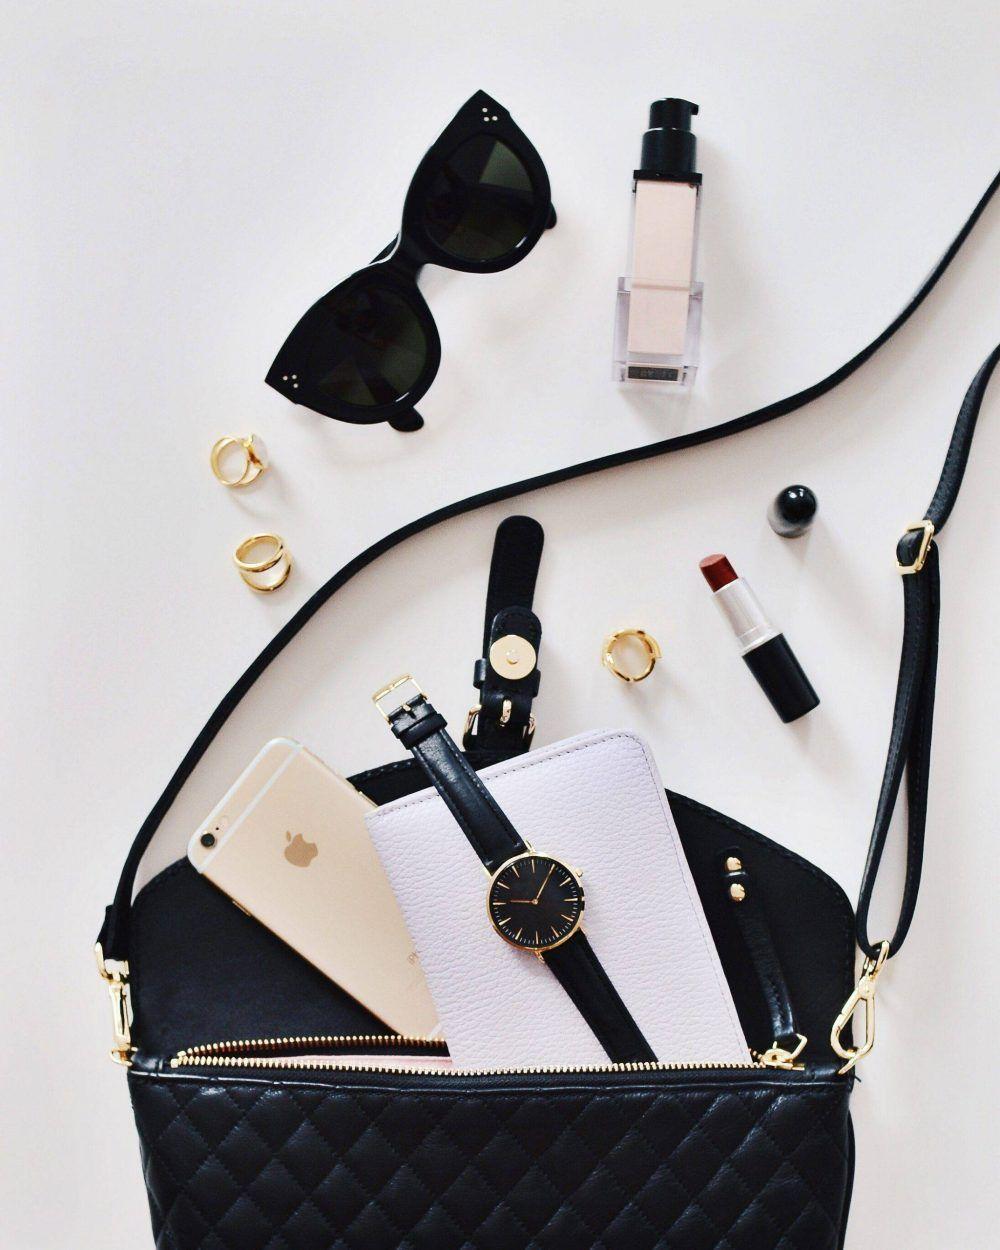 Check it out! #shoppingonline #shoppingday #shoppingaddict #ijustbuyit #fashion #apparel #jewely